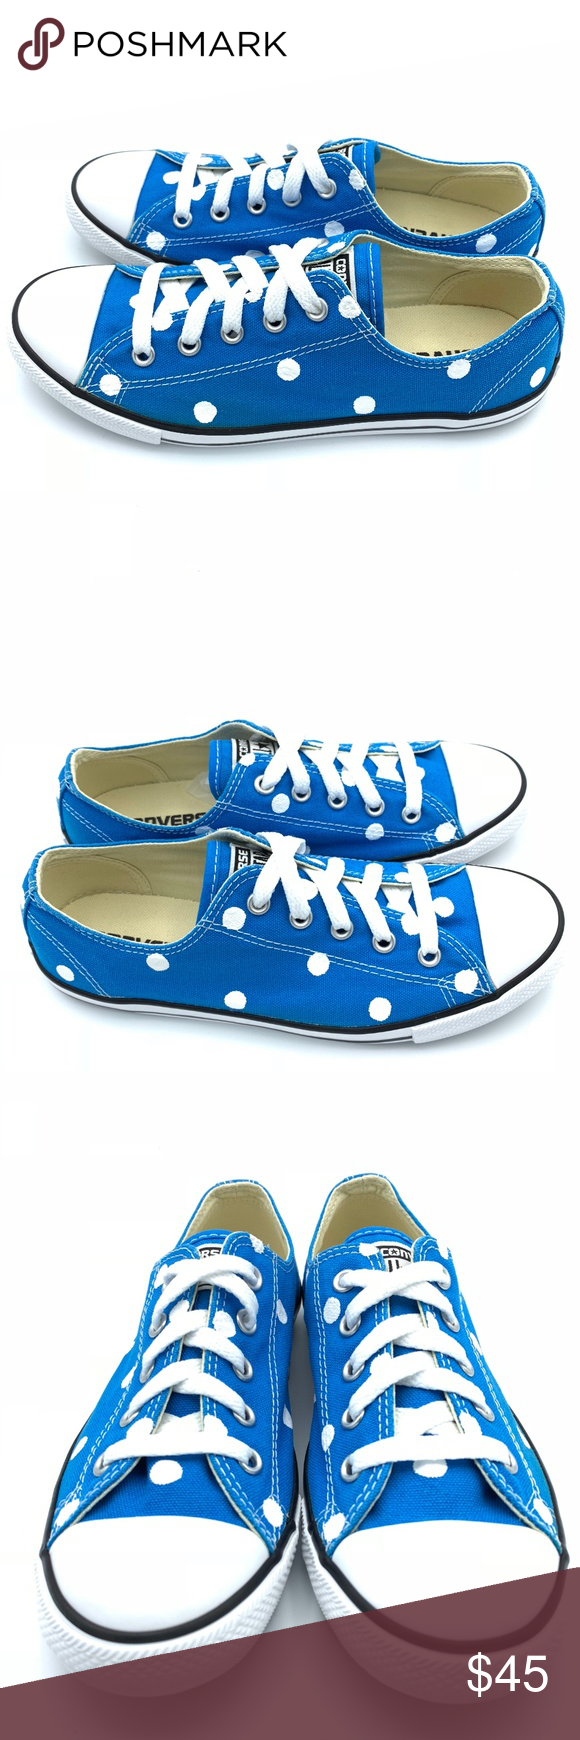 Converse Dainty 6 CLOISONNE BLUE Polka Dot CTAS Hand painted women s Converse  Dainty Chuck Taylor All df72ddd70